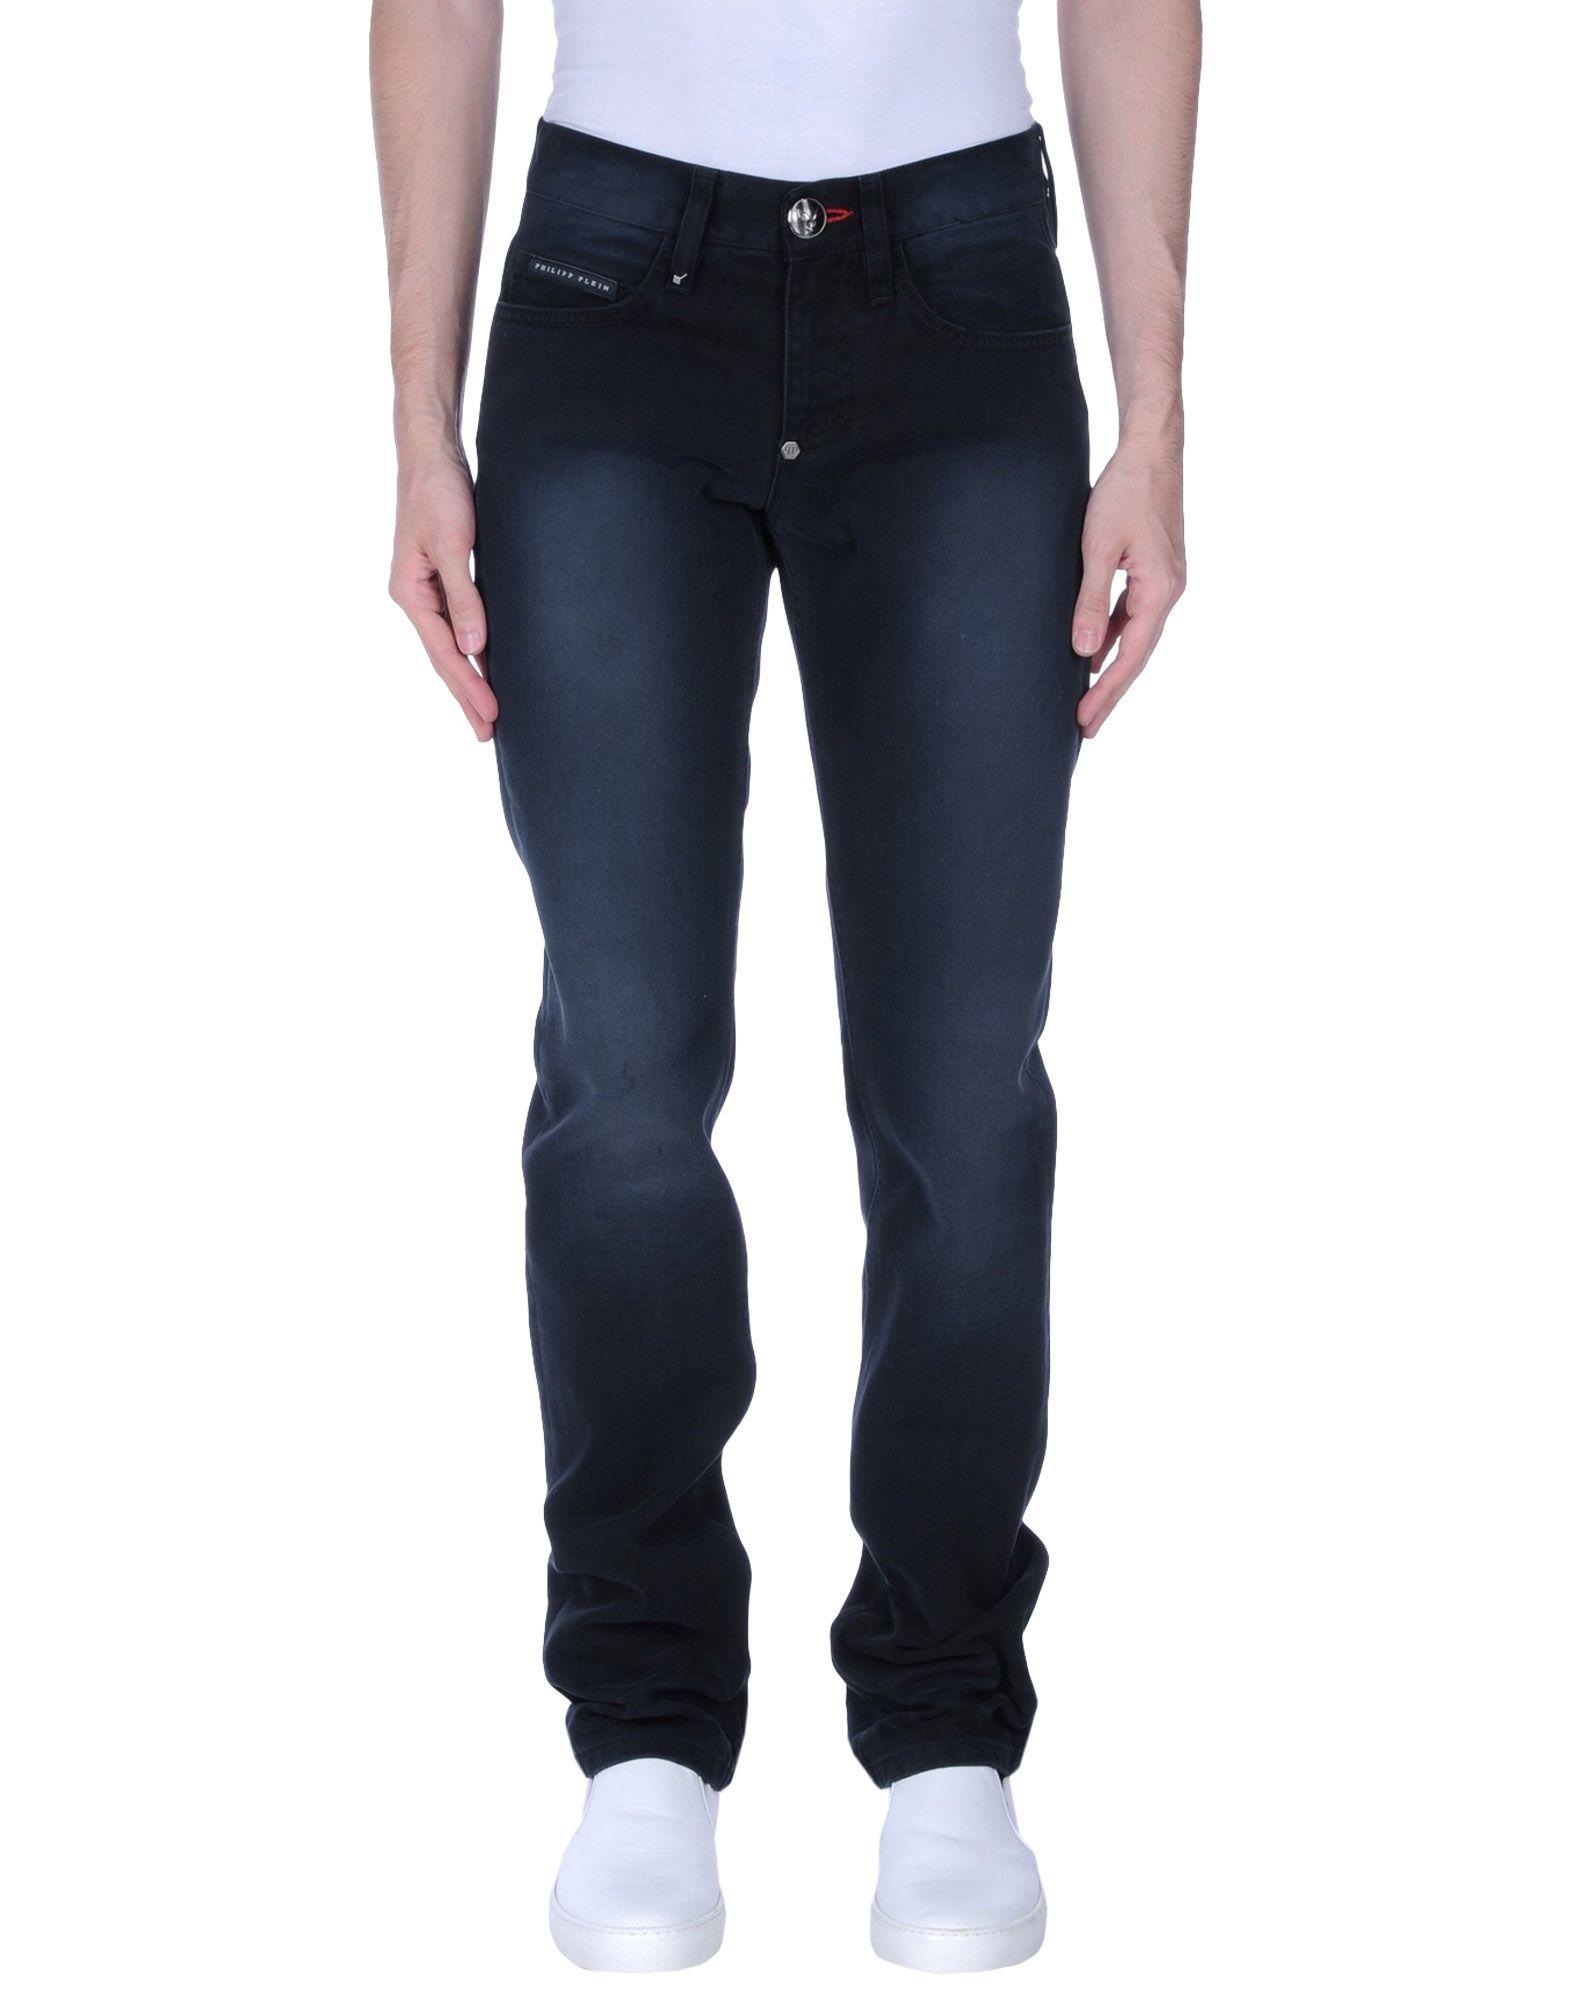 Pantaloni Jeans Philipp Plein uomo uomo - 42621799GI  Online-Verkauf